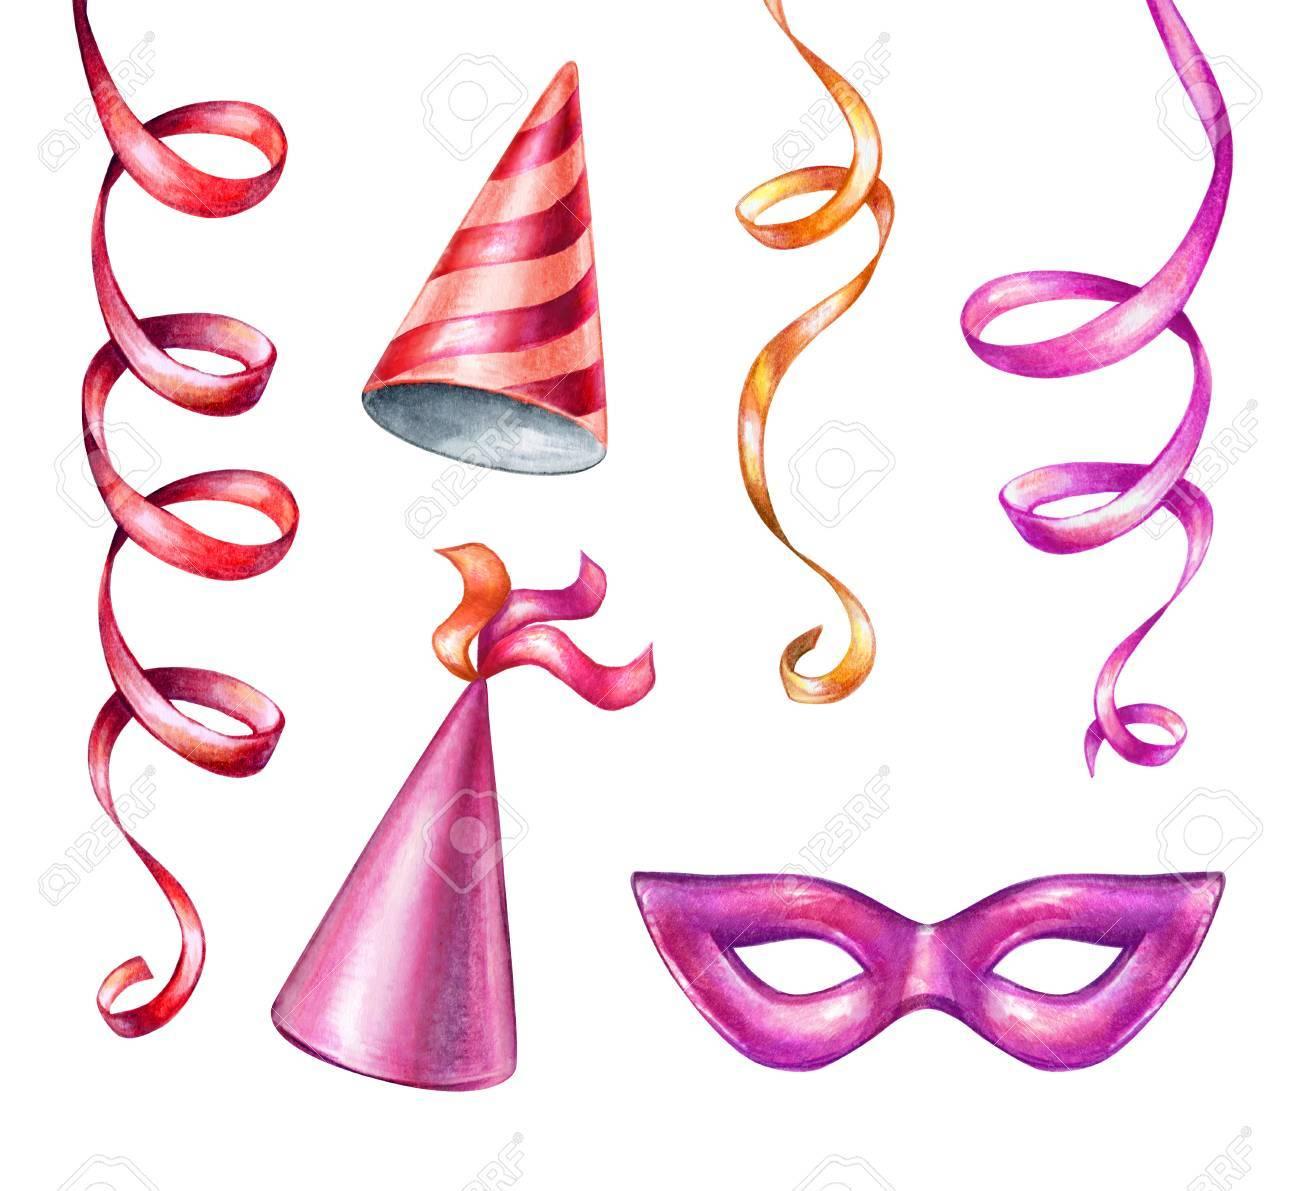 Aquarell Illustration Festliche Clipart Party Accessoires Bander